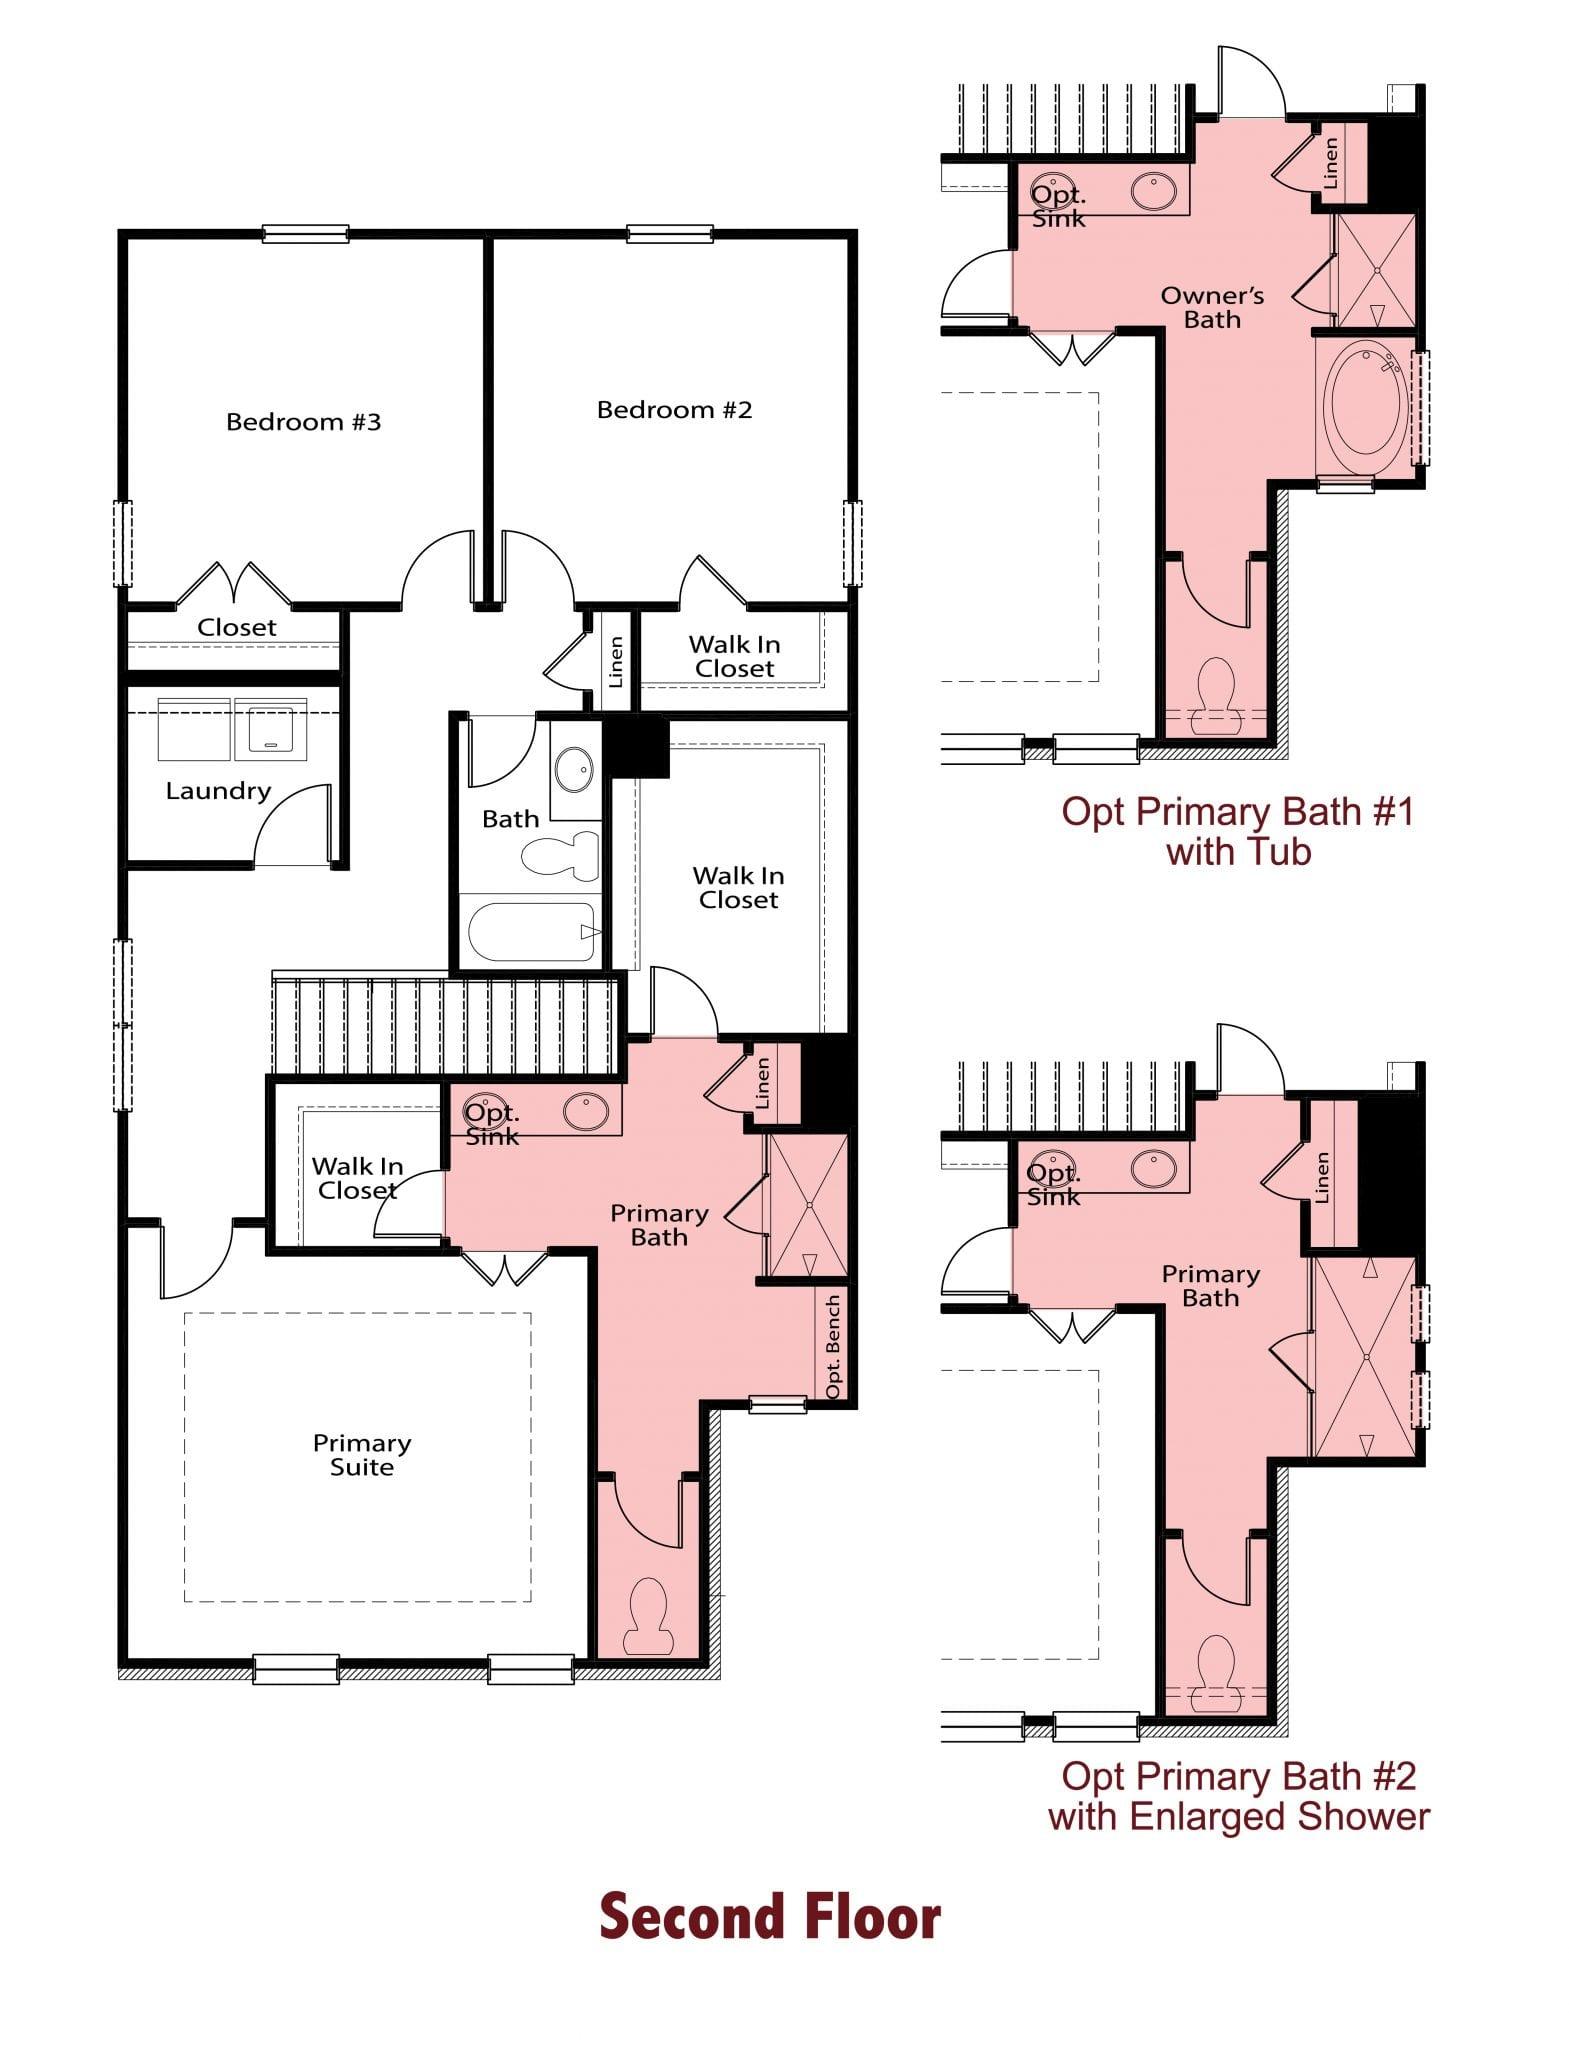 Clayton plans Image